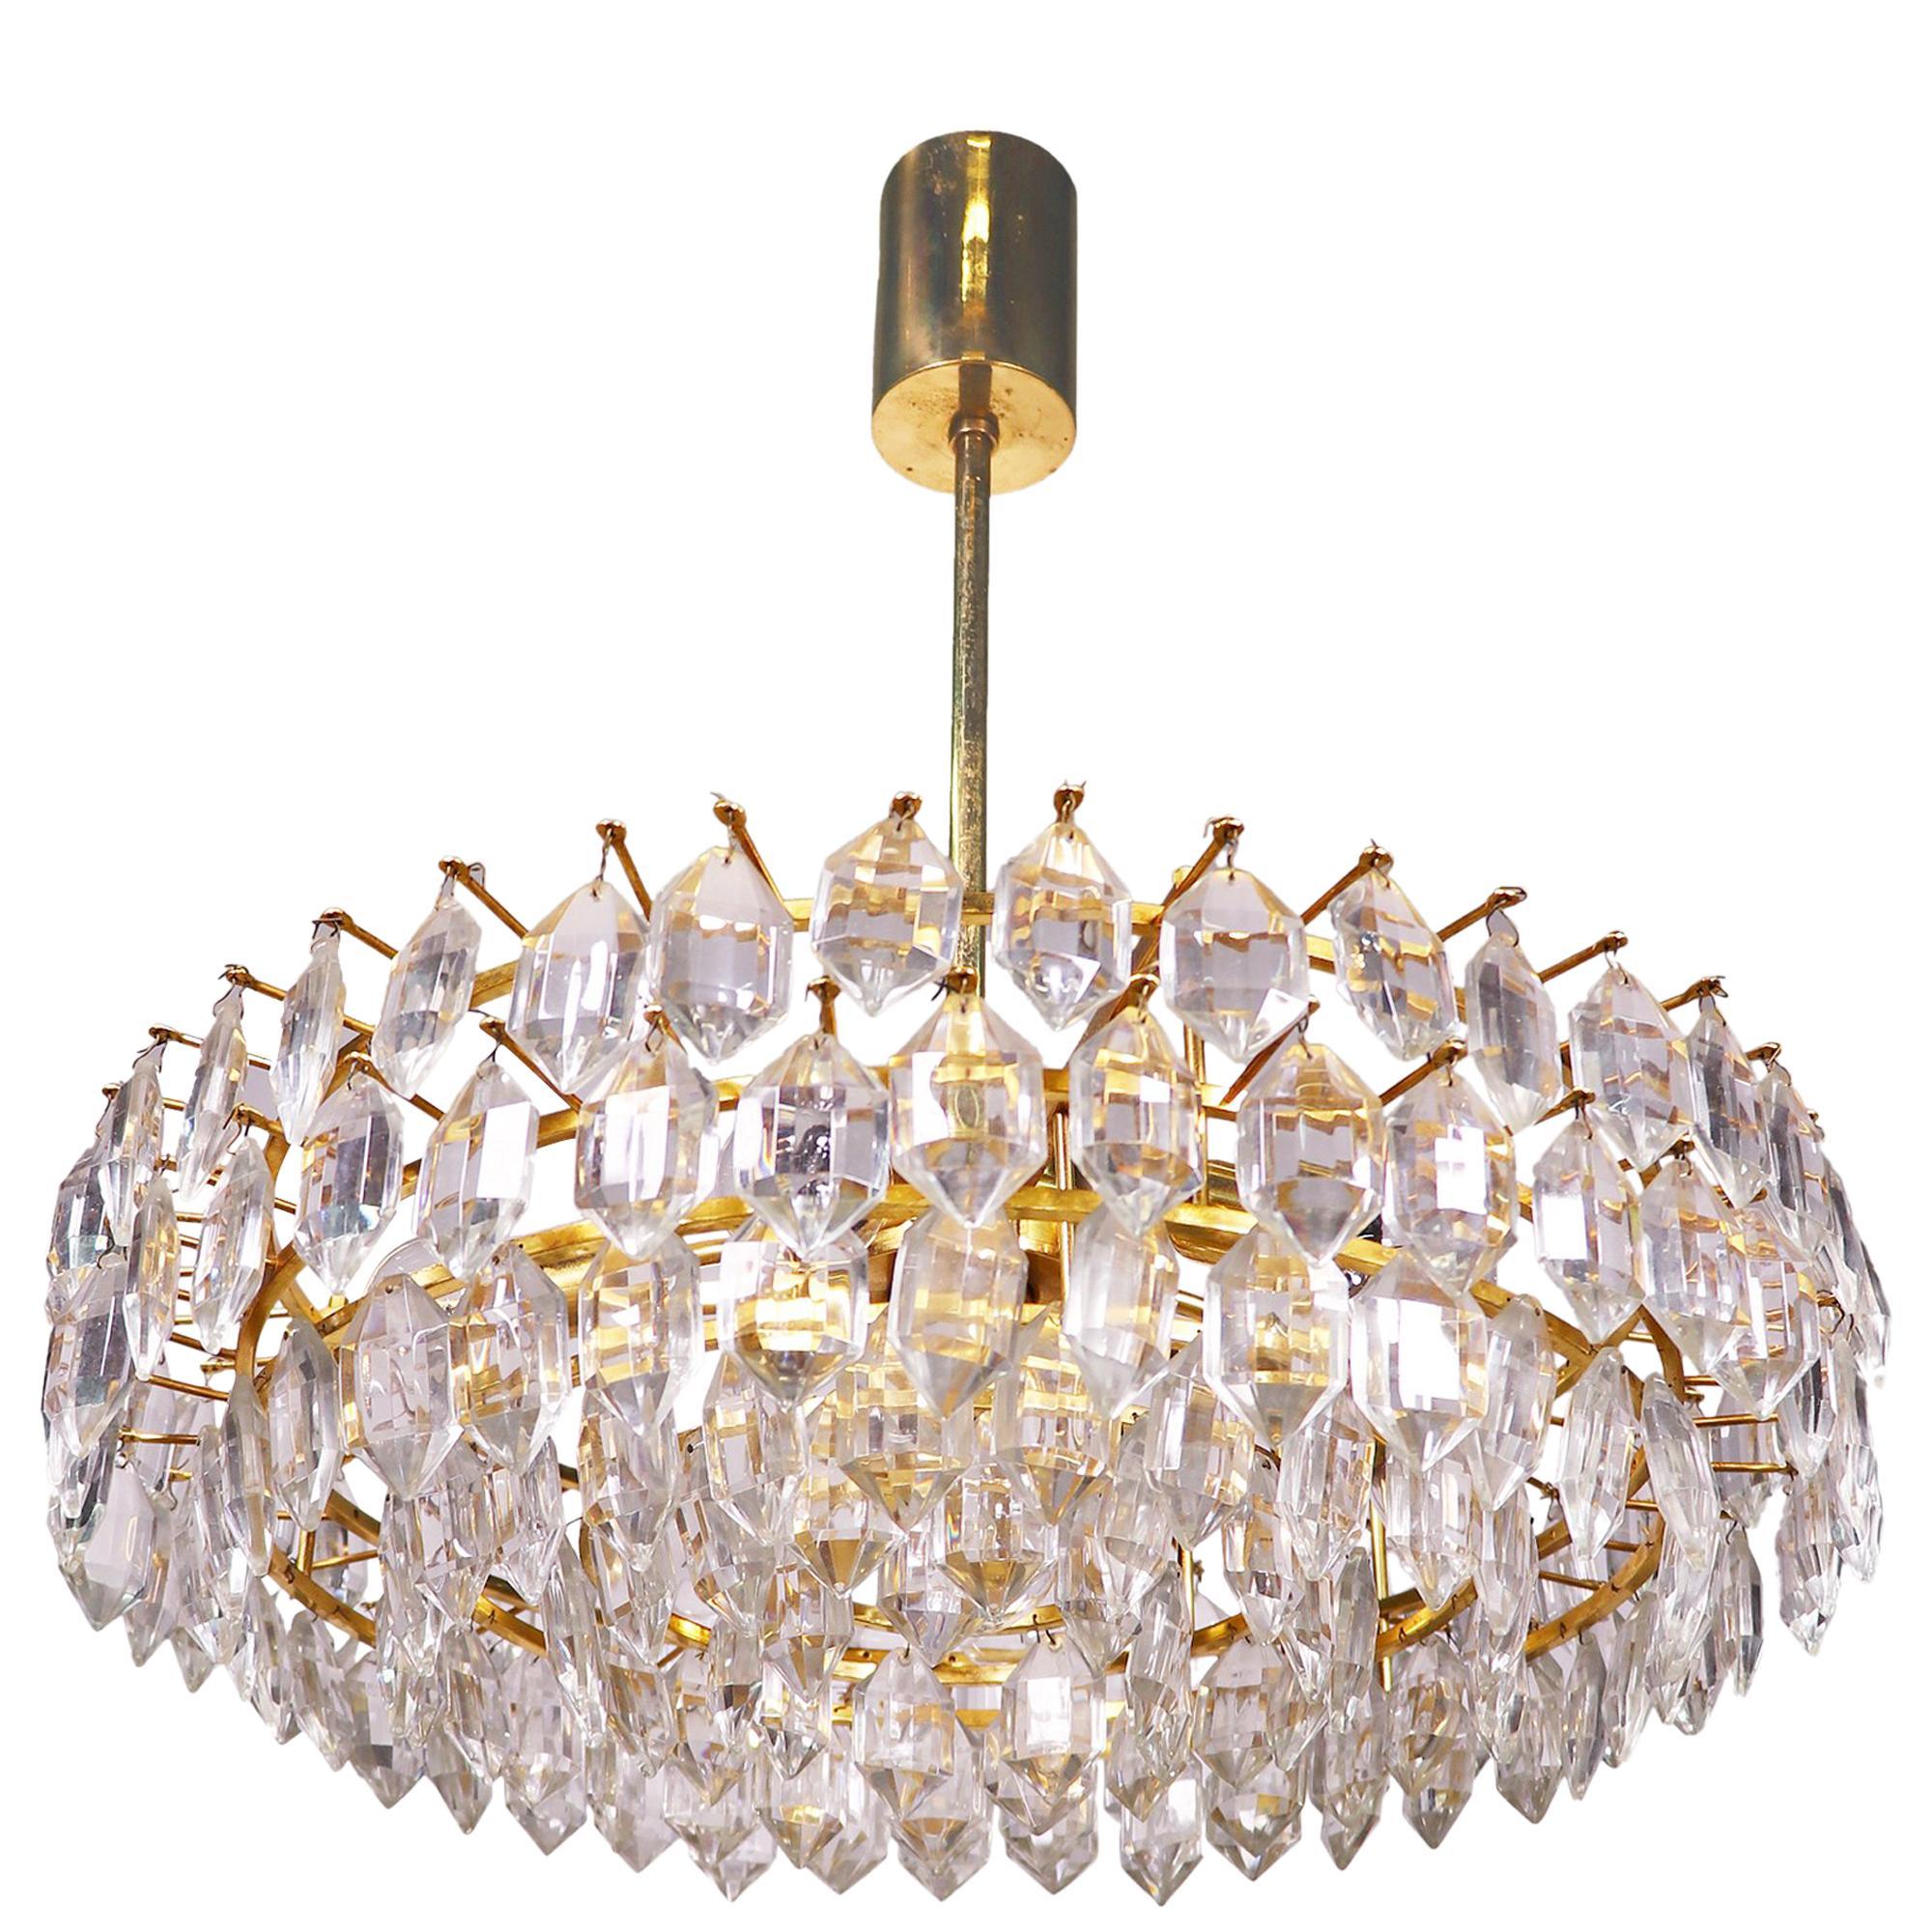 Vienna Lobmeyr / Bakalowits & Sons Large Chandelier Crystal & Brass